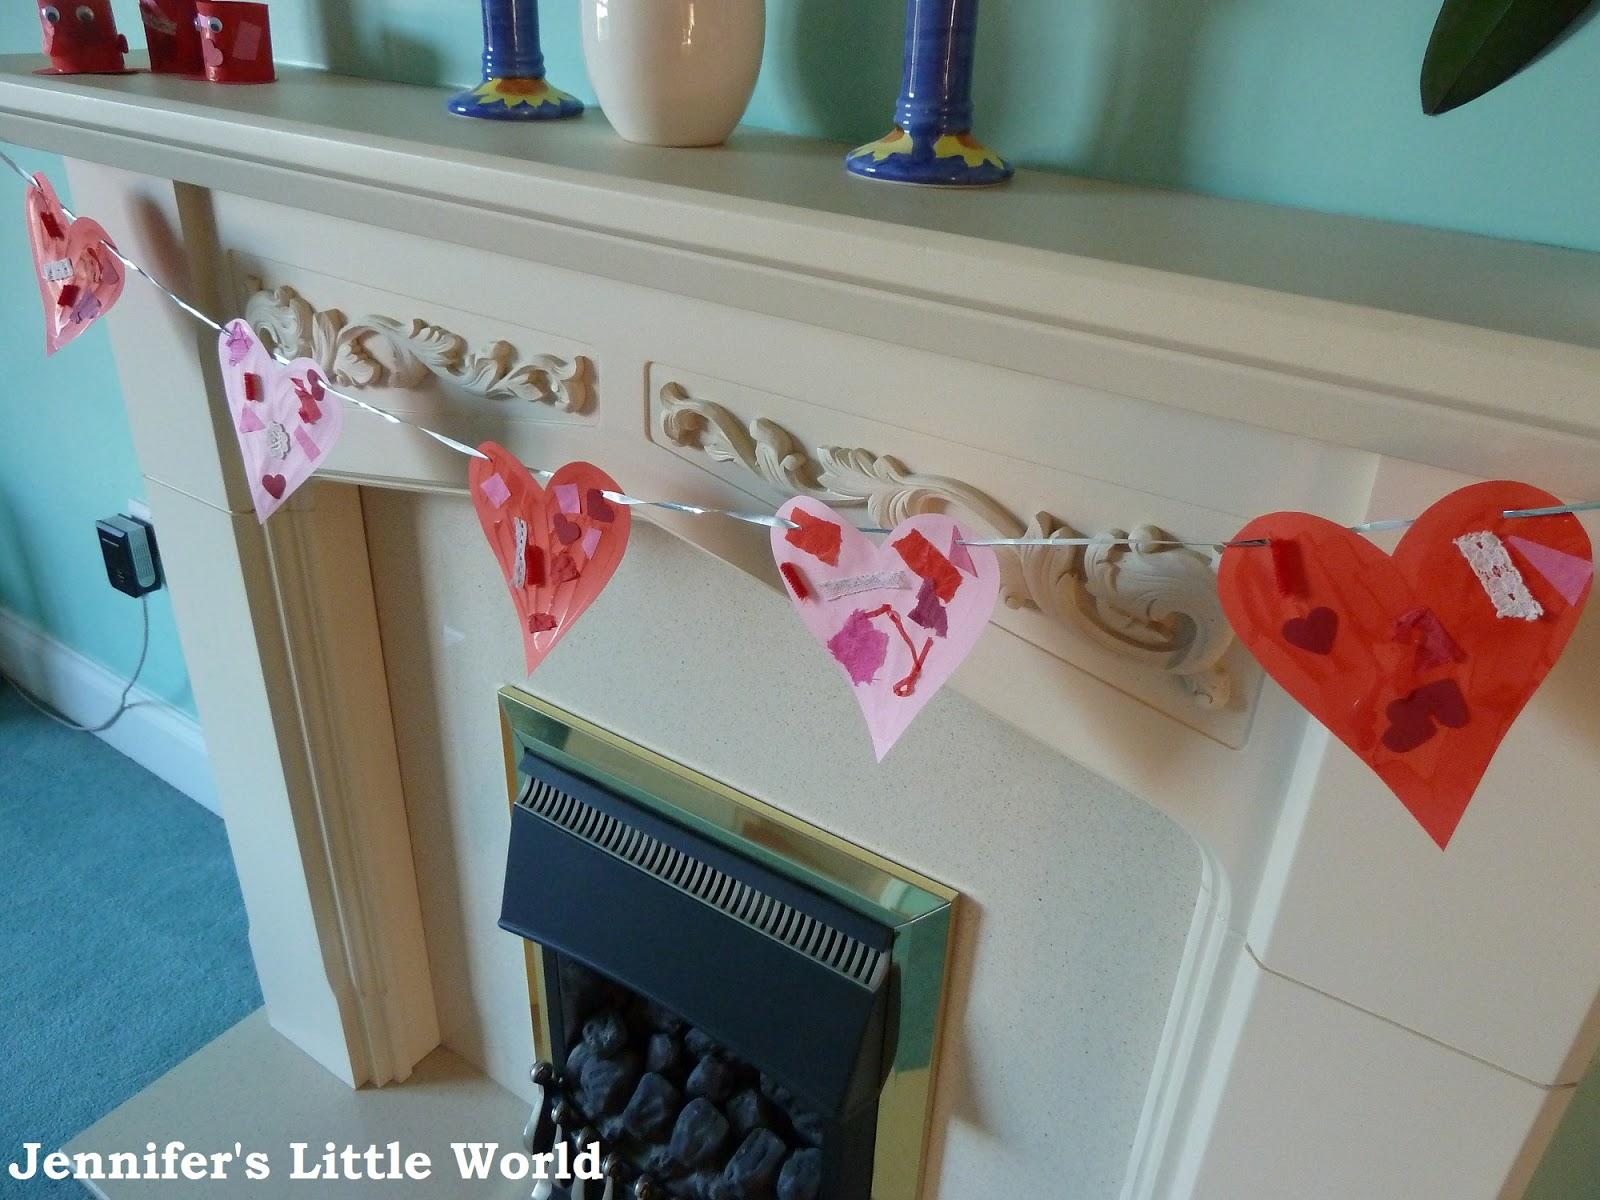 Jennifer s Little World blog Parenting craft and travel